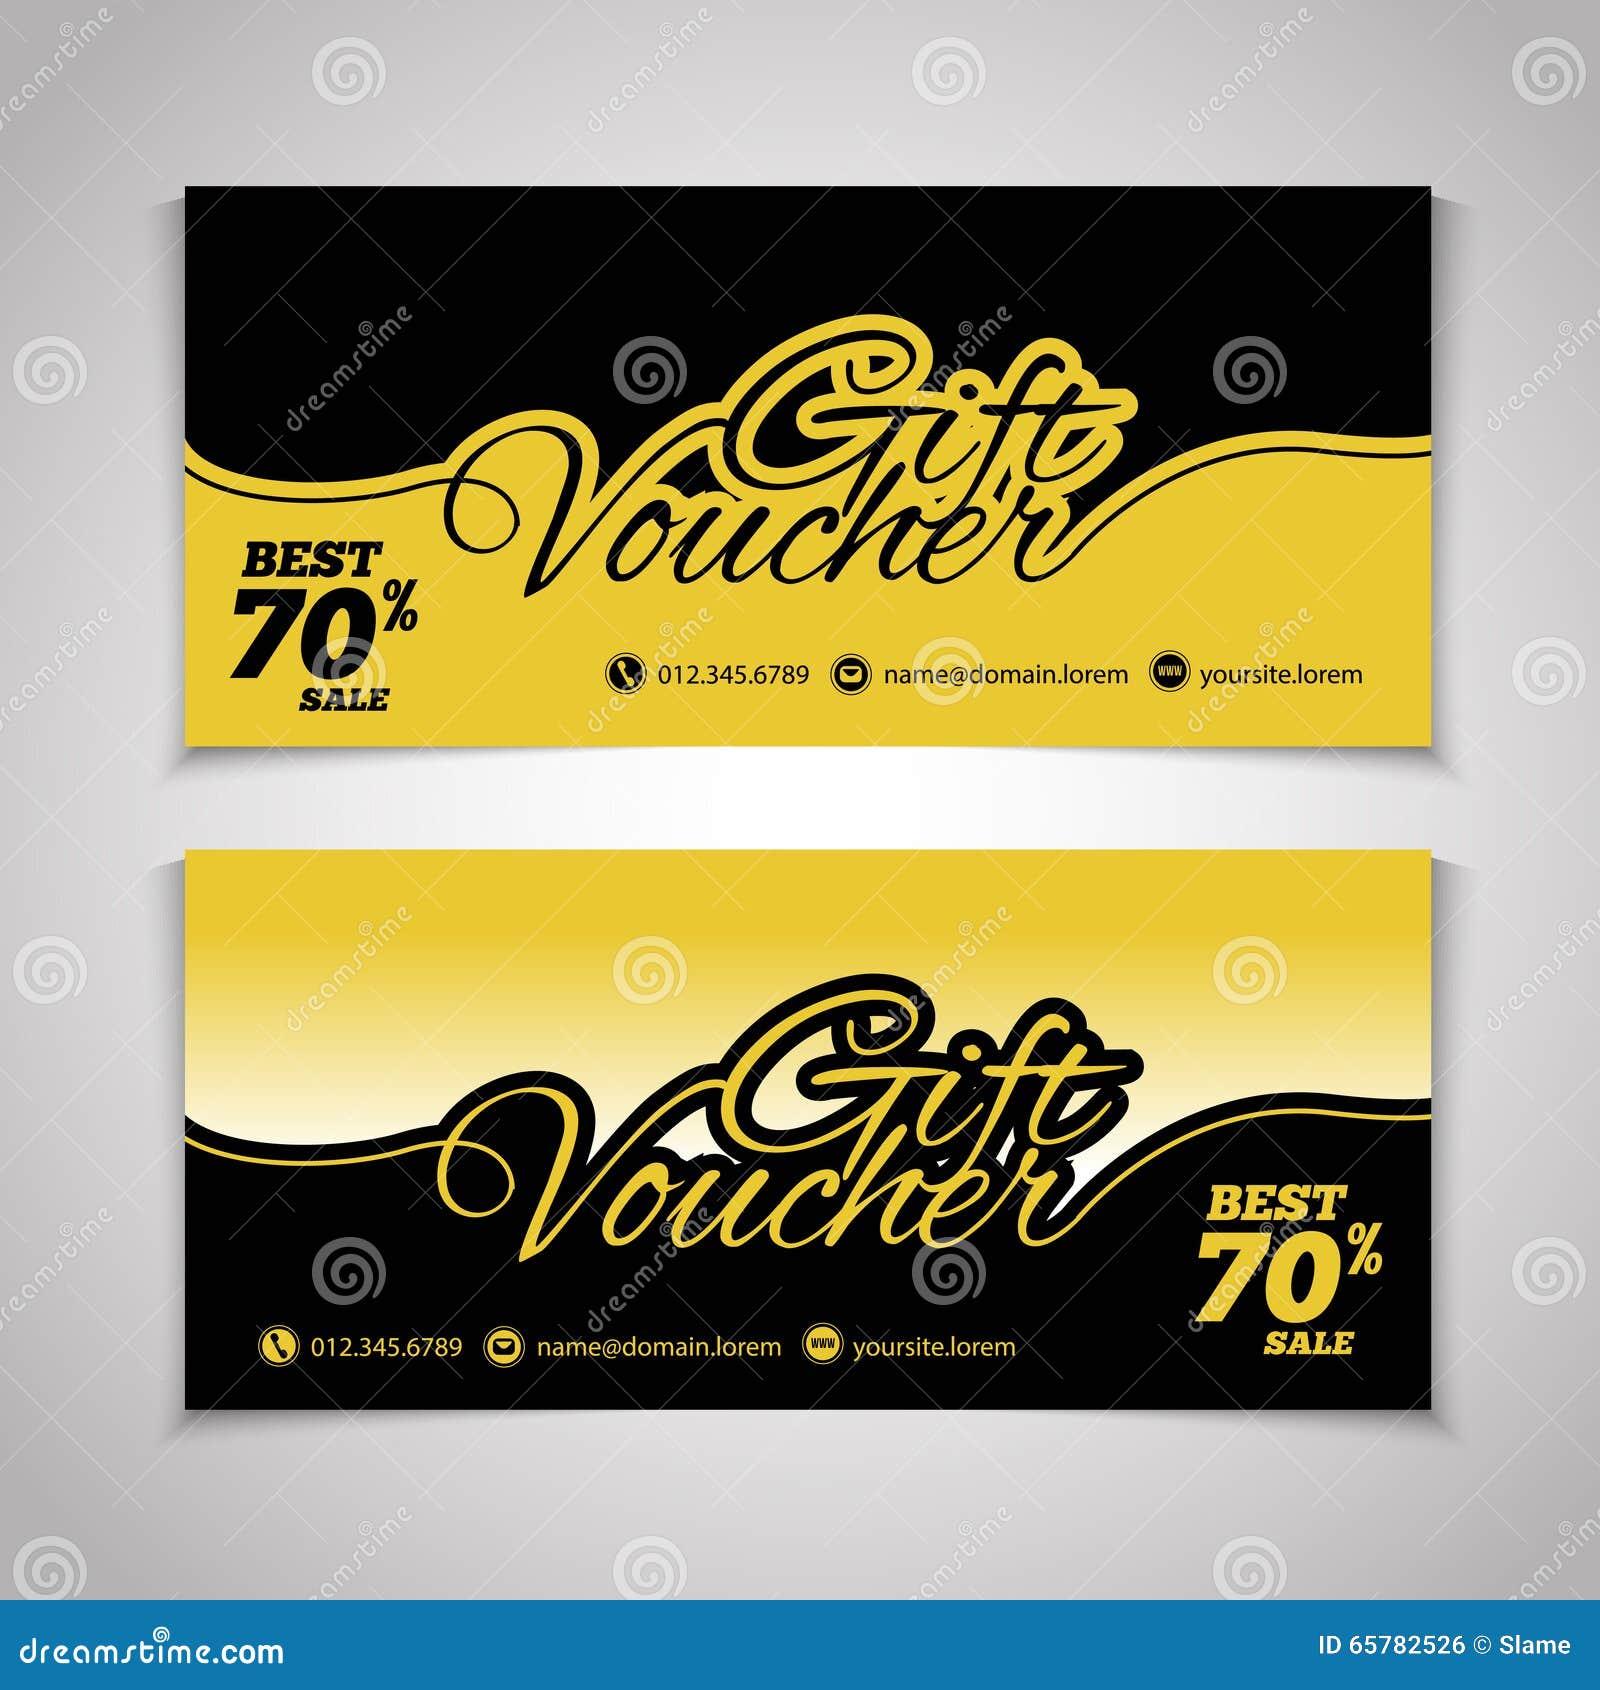 abstractgiftvouchercoupondesigntemplatevoucherdesign blankprintvectorflyer65782526jpg – Voucher Design